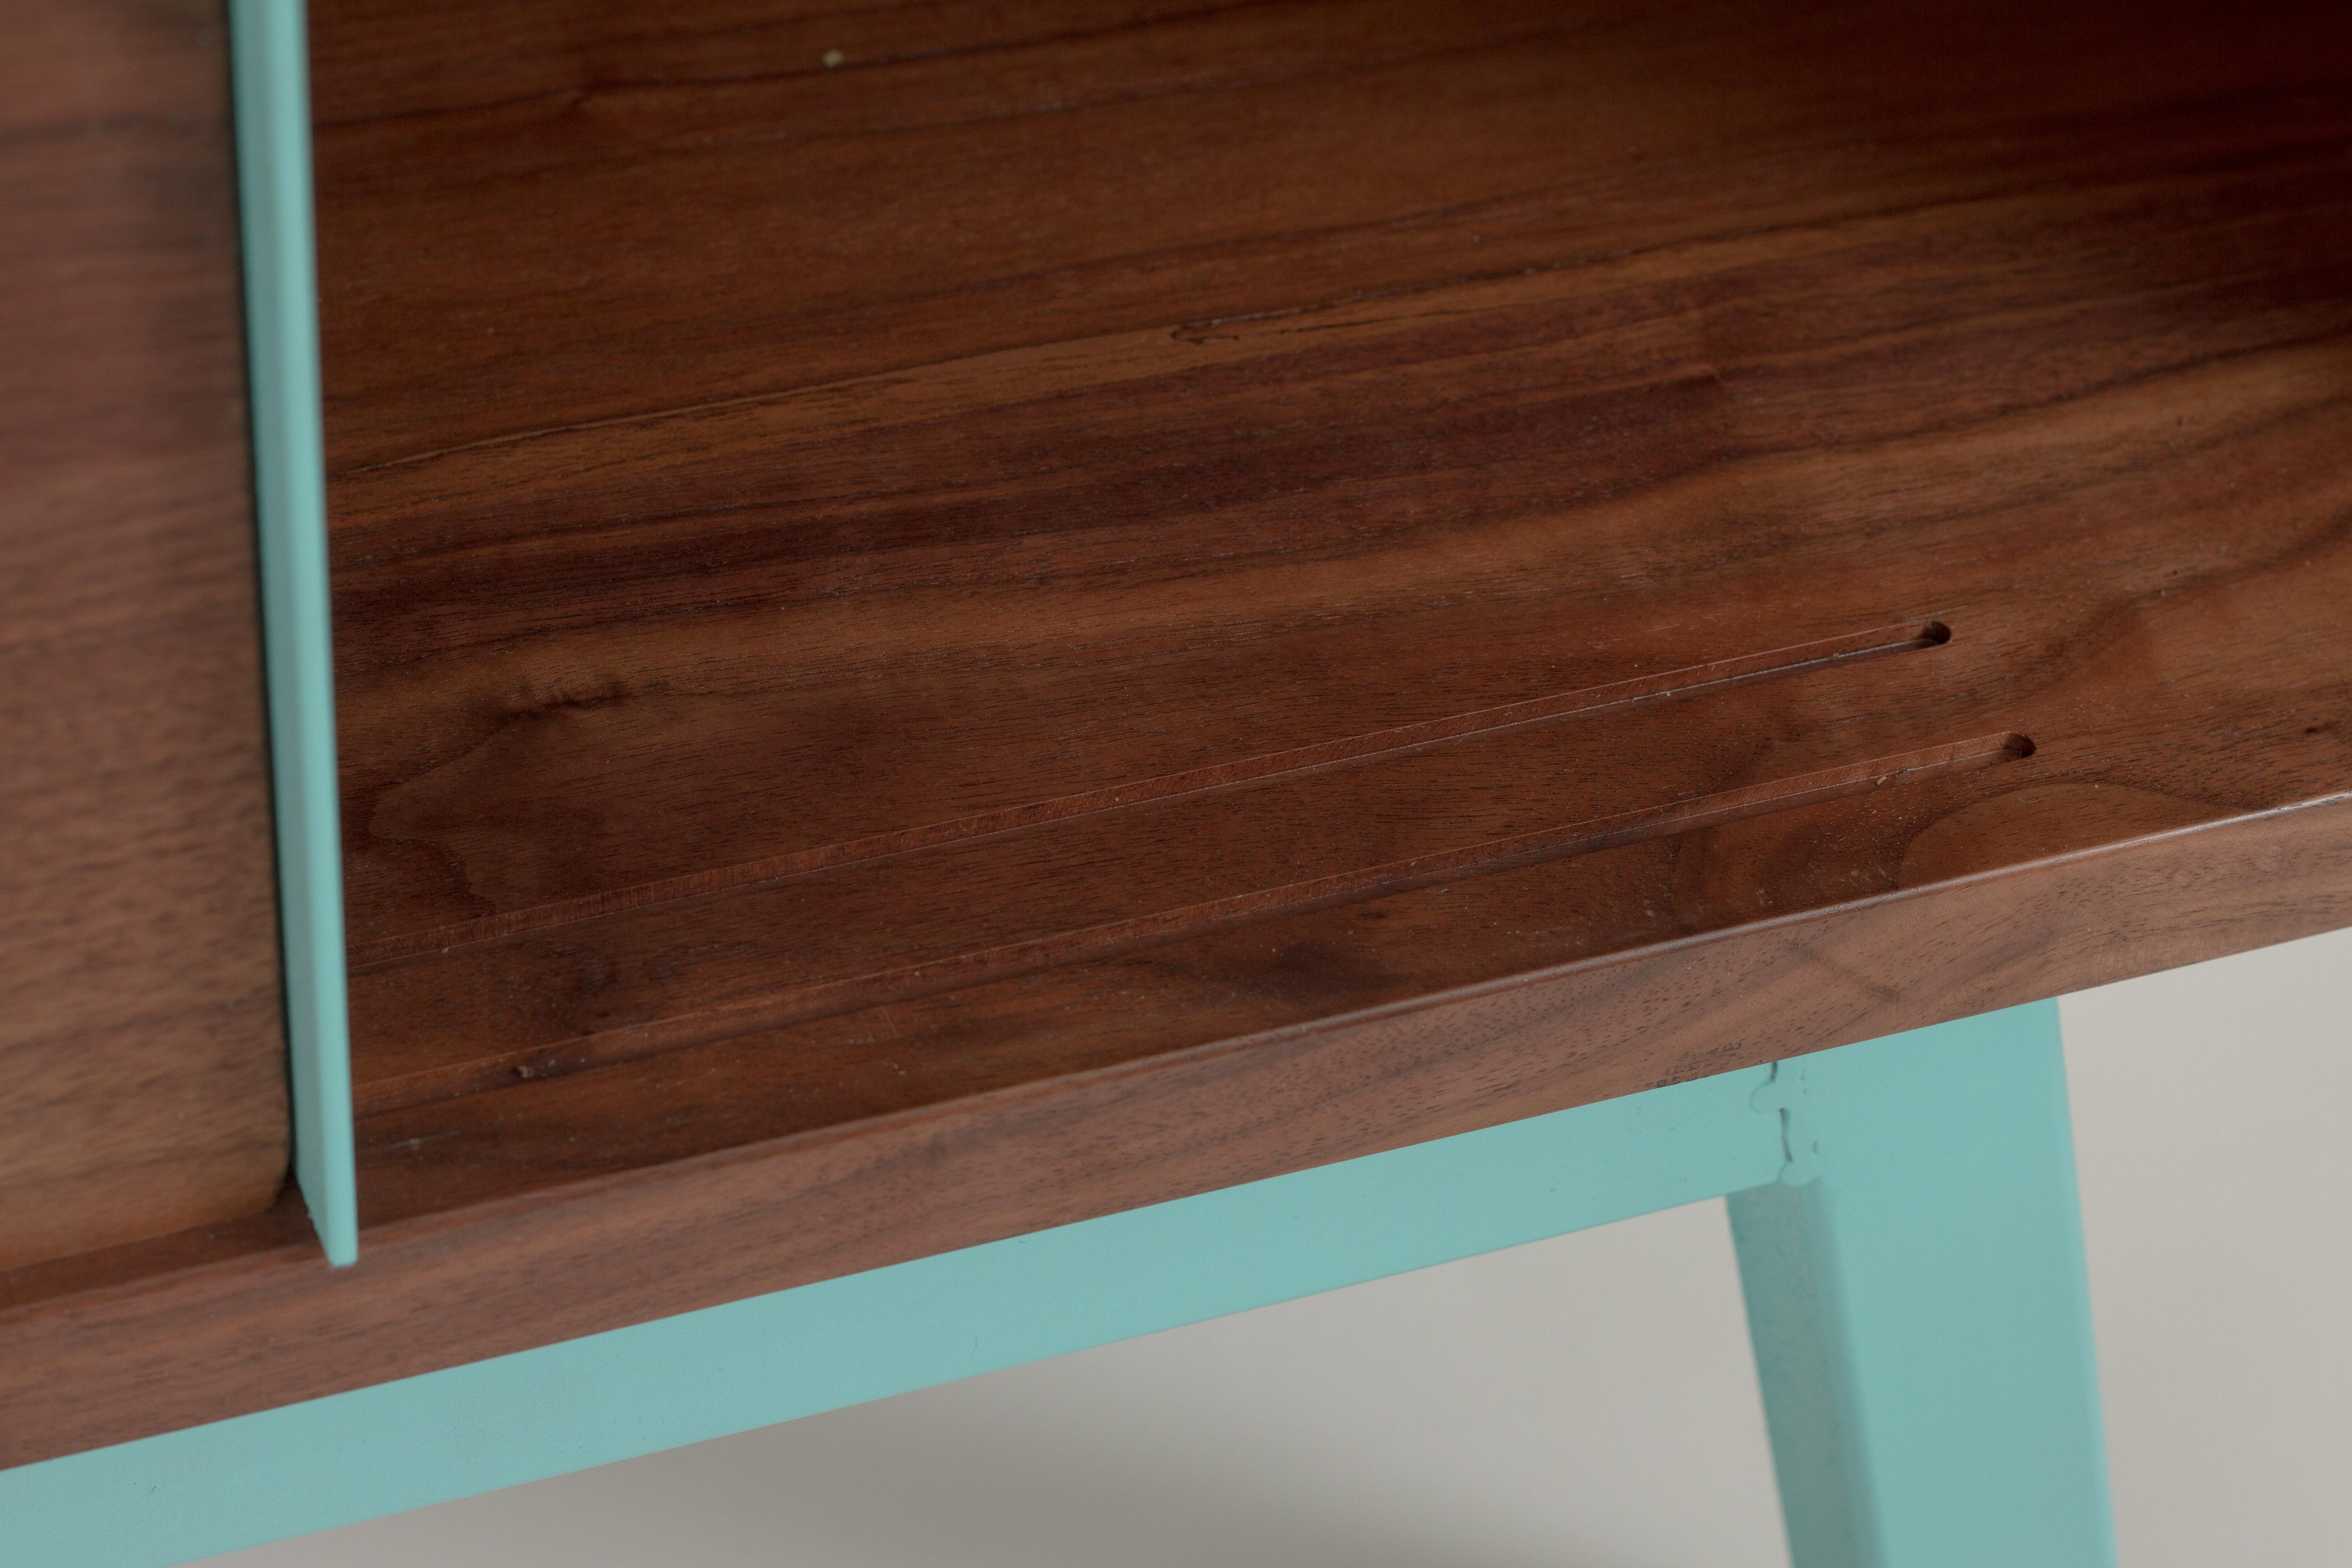 Solid Walnut Media Console Credenza Mid Century Modern Mcm Living Room Vanport Furniture